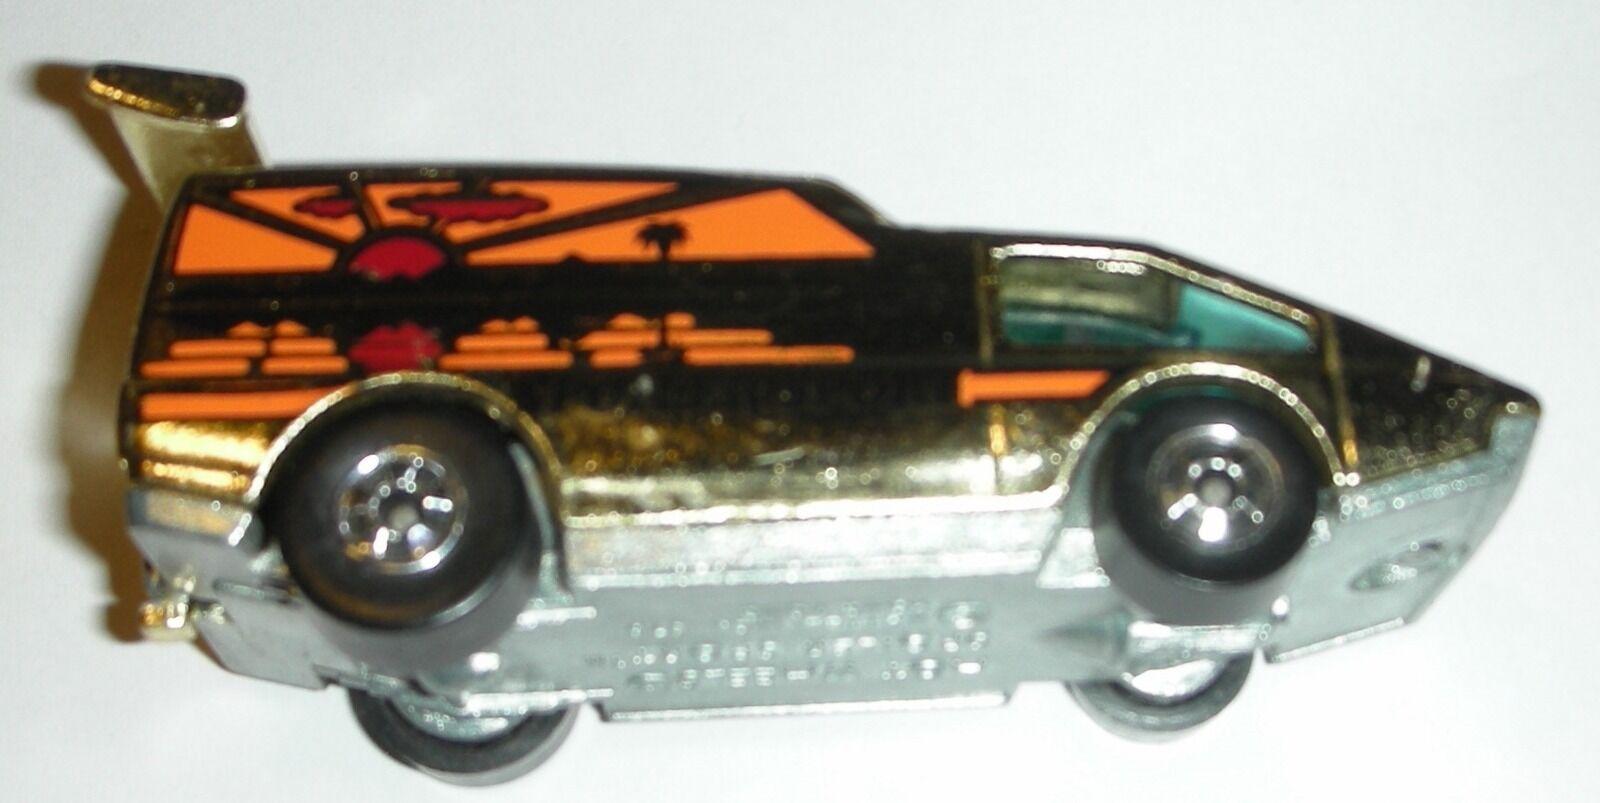 Gold Spoiler Sport 1976 Hot Wheels Die-Cast Car Loose Made in Hong Kong 1 64